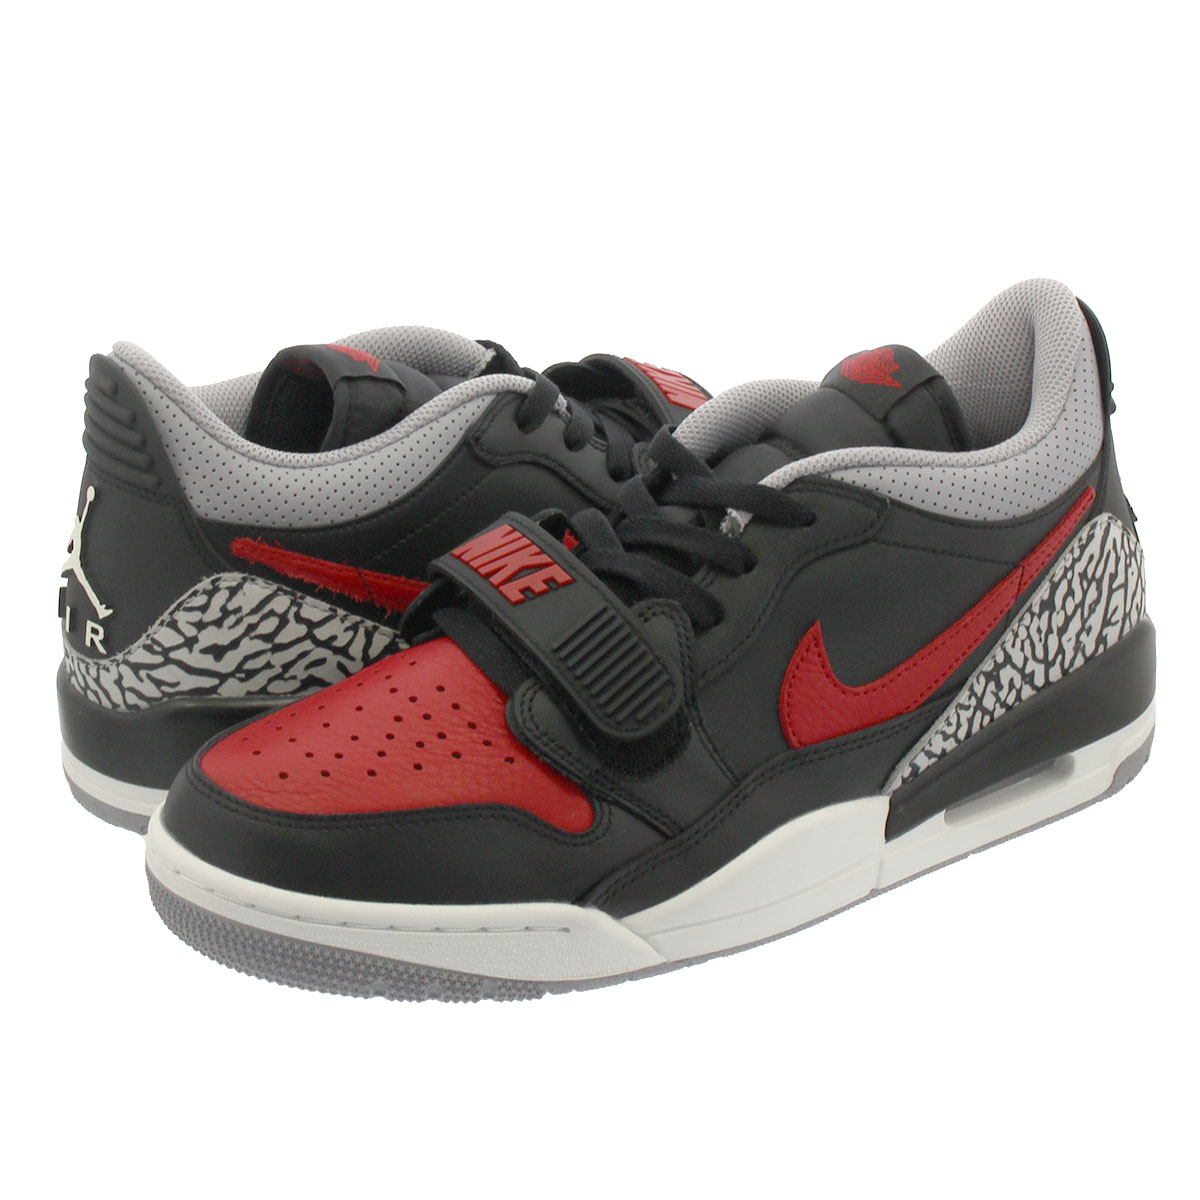 Legacy Grey 006 Jordan Redblackcement Cd7069 Nike 312 Low Blackgym Air b7gyvfY6I